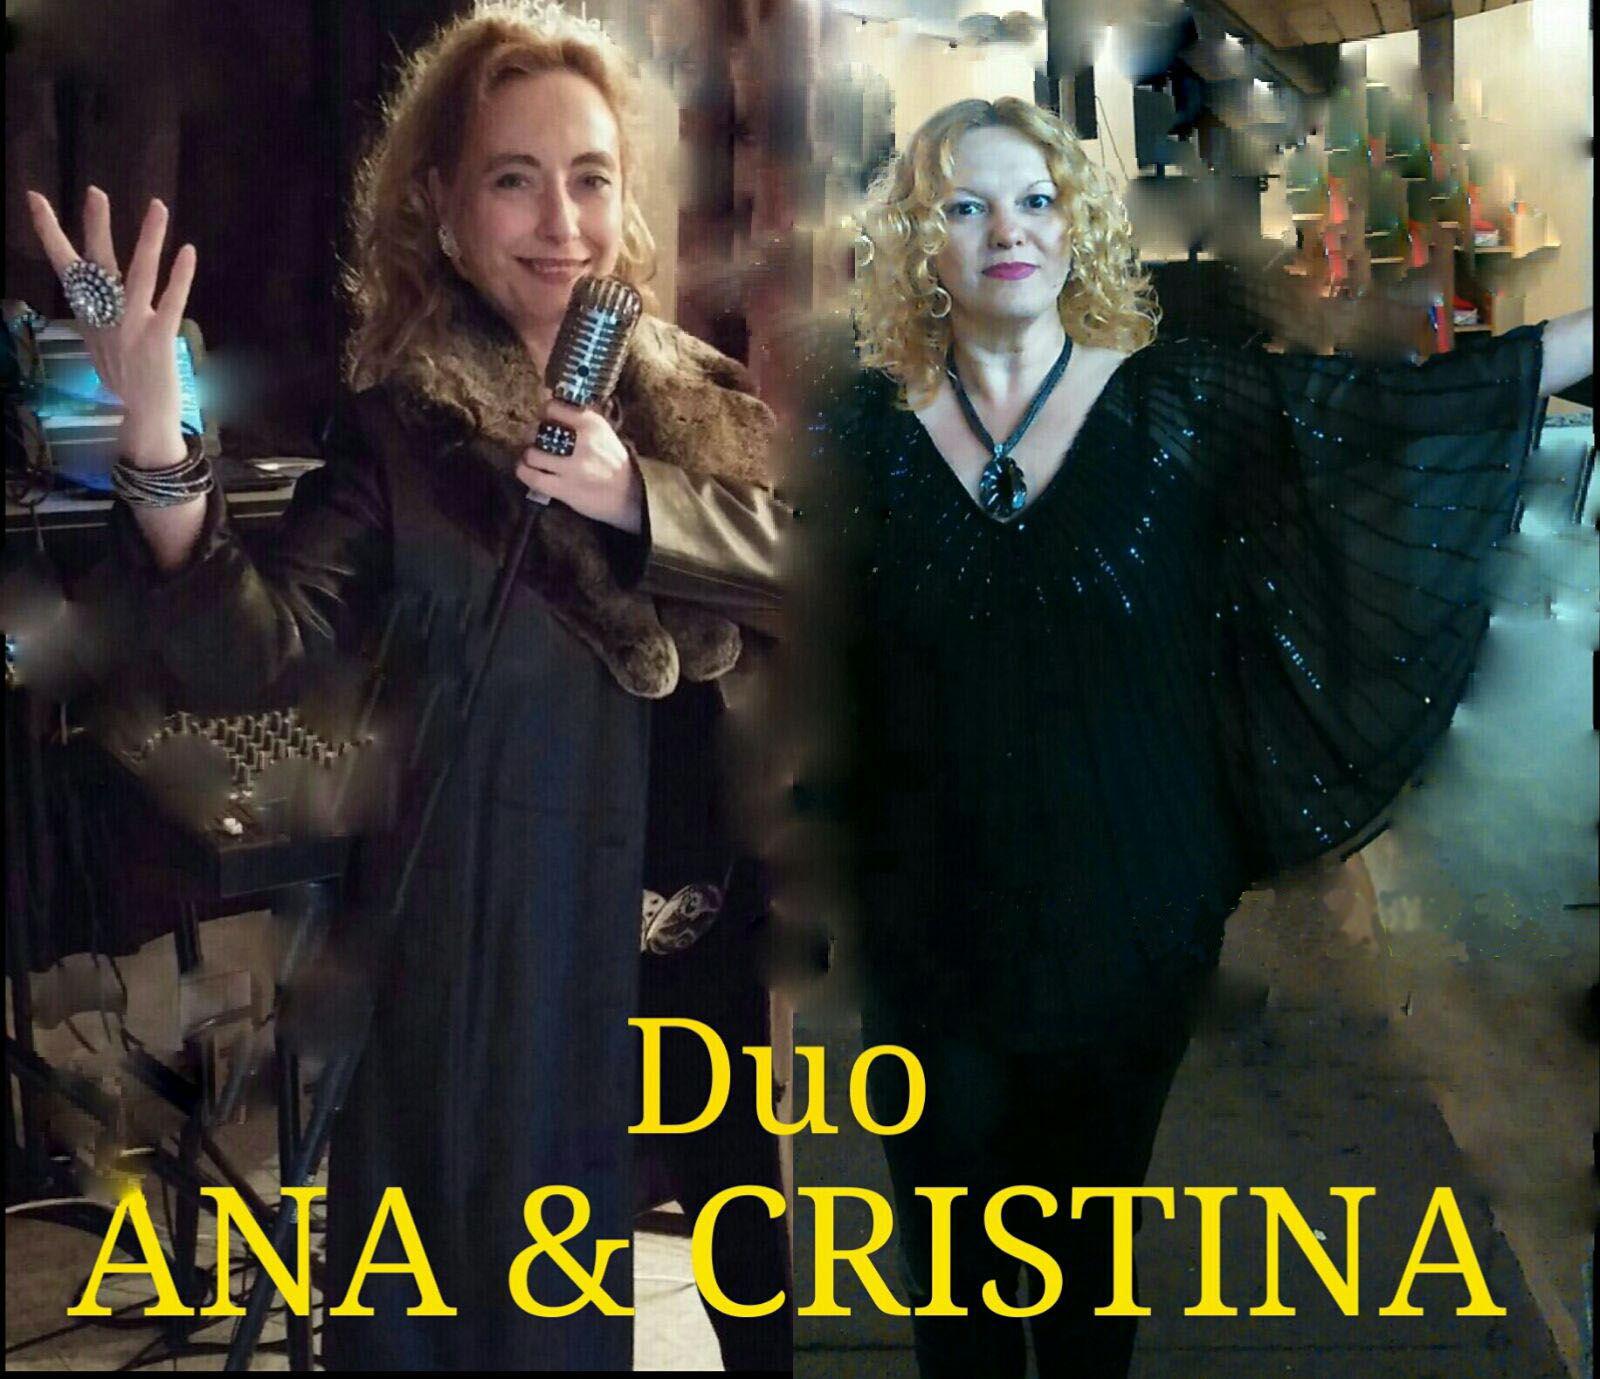 Dúo Ana y Cristina